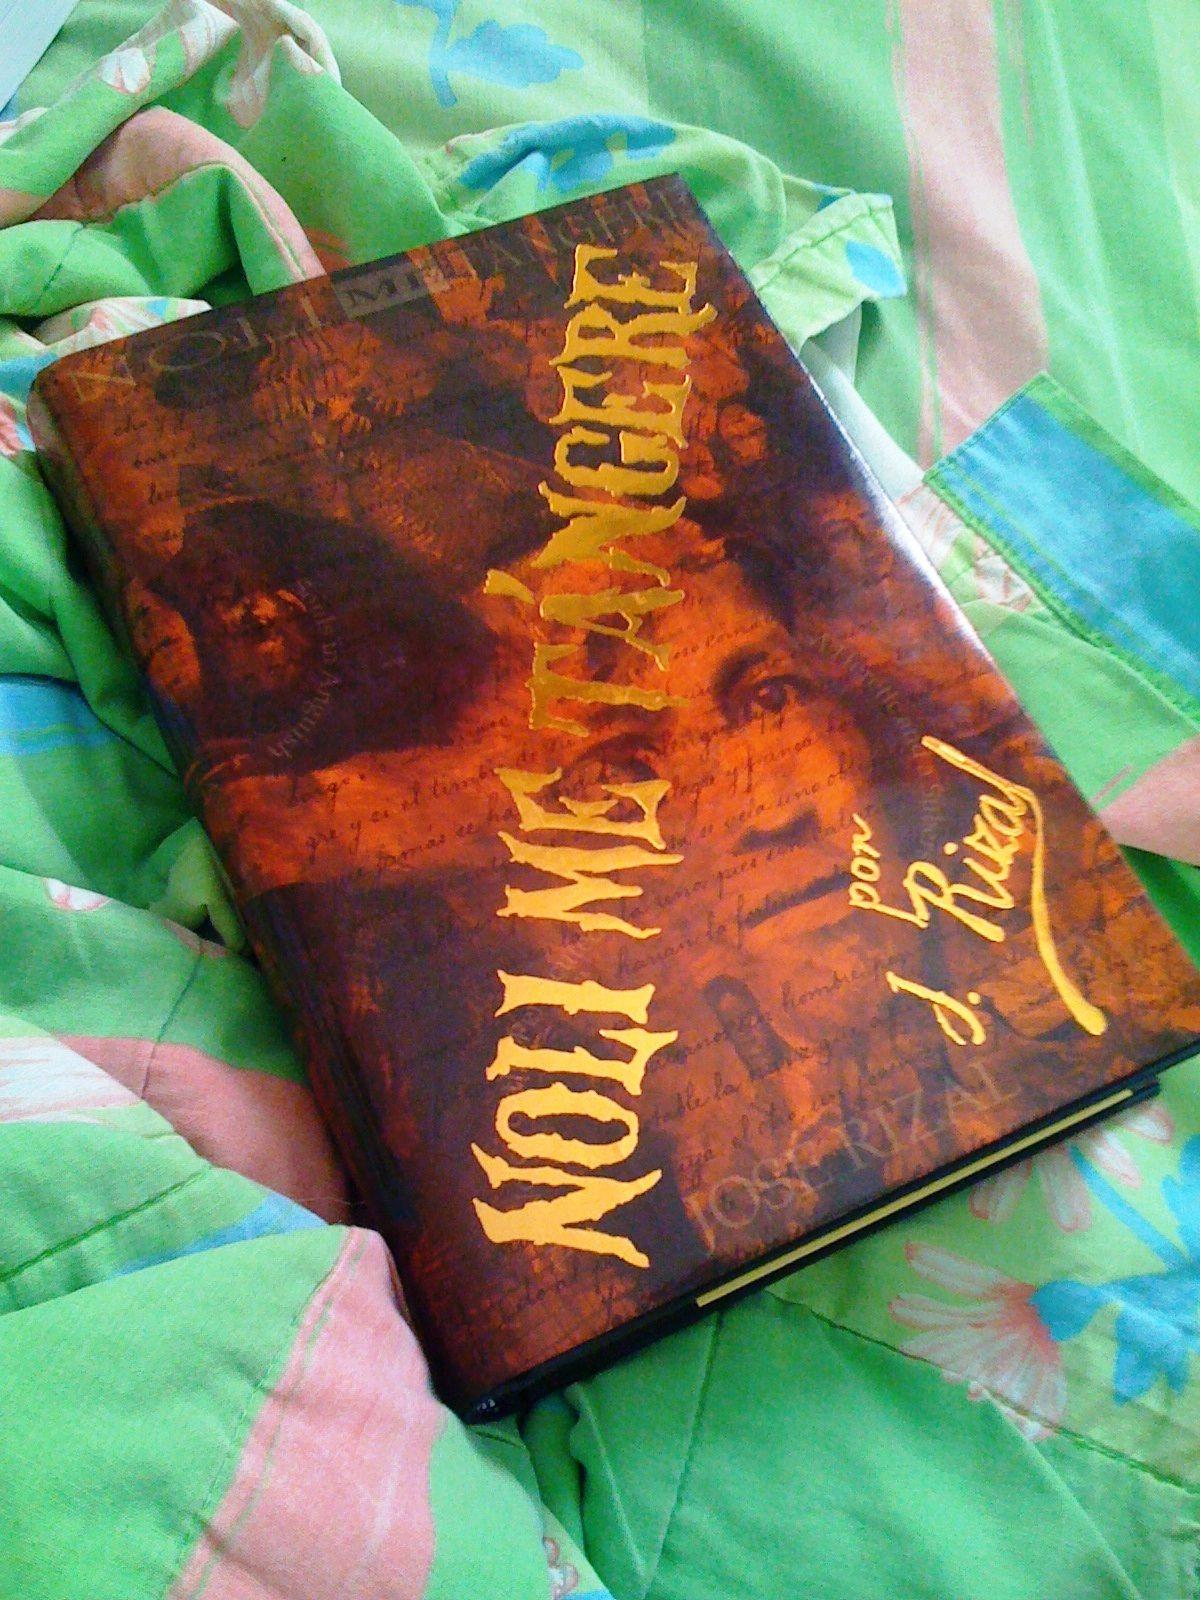 Noli Me Tangere is a novel by